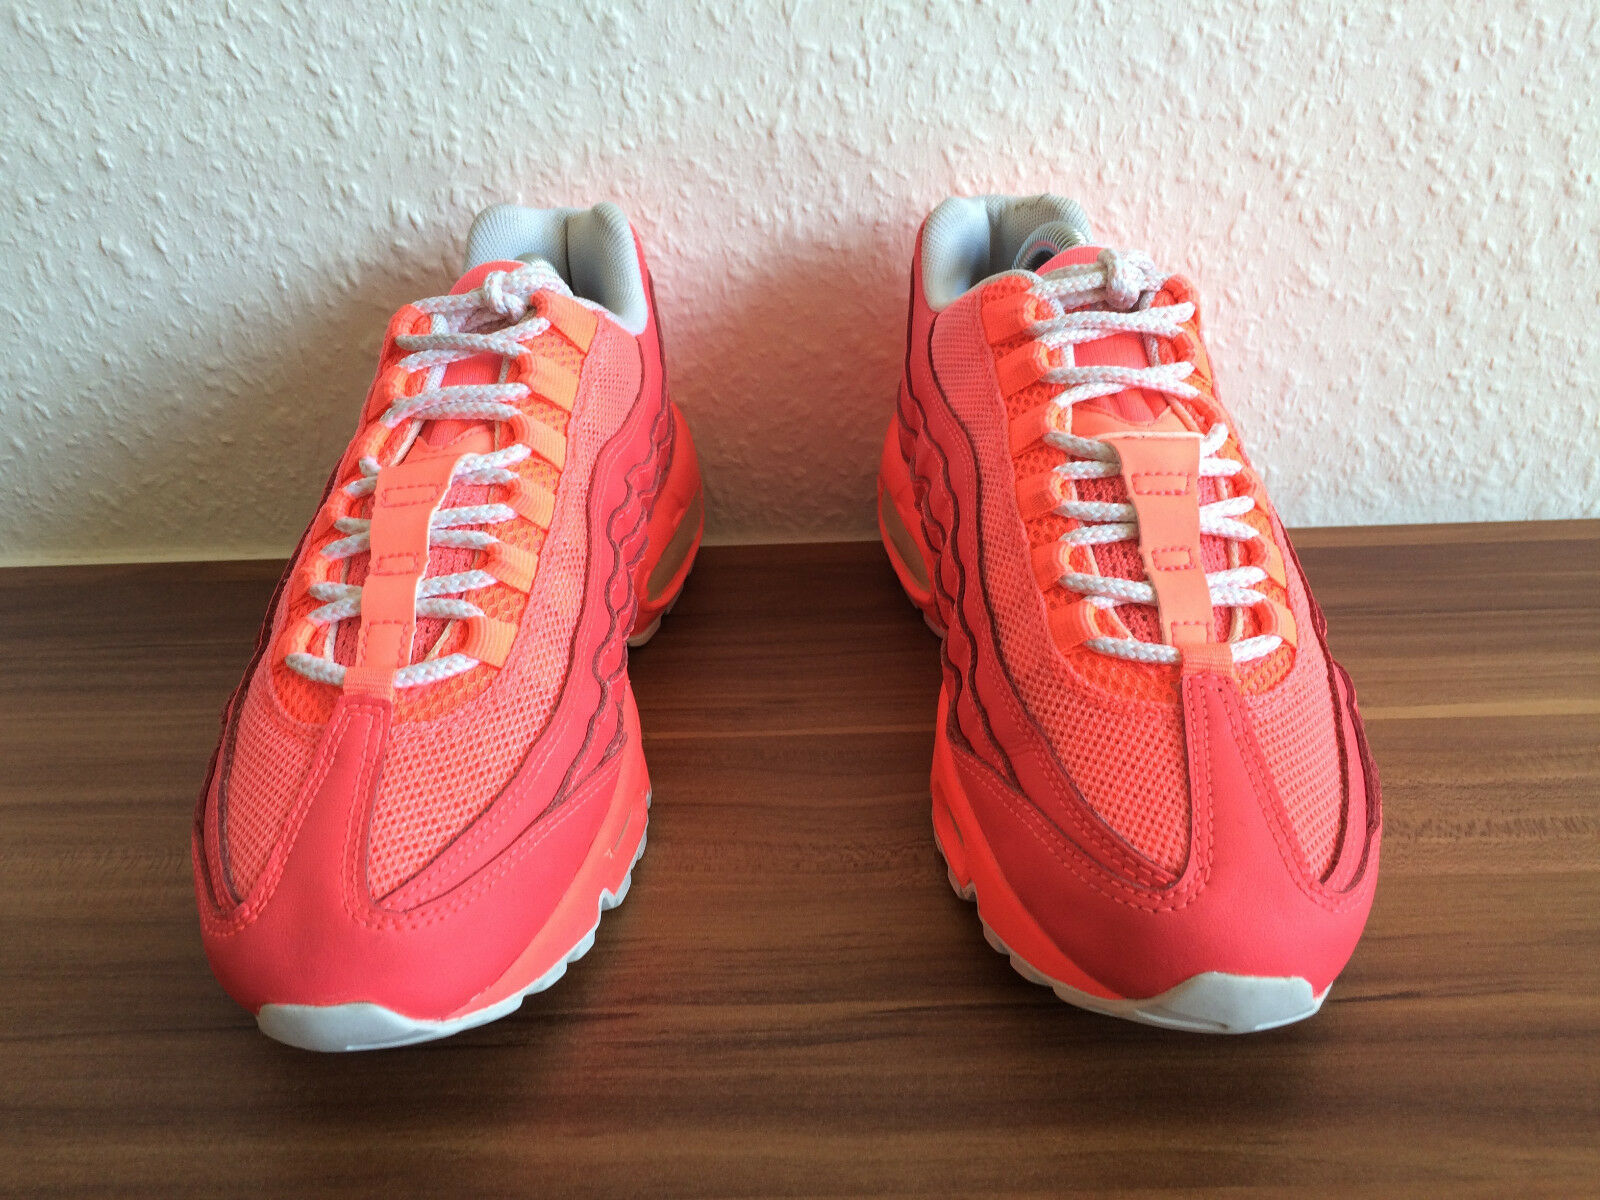 Super Gr. Nike Air Max 95 Damen Sneaker Schuhe Laufschuhe Gr. Super 37,5 / UK 4 10a2d6